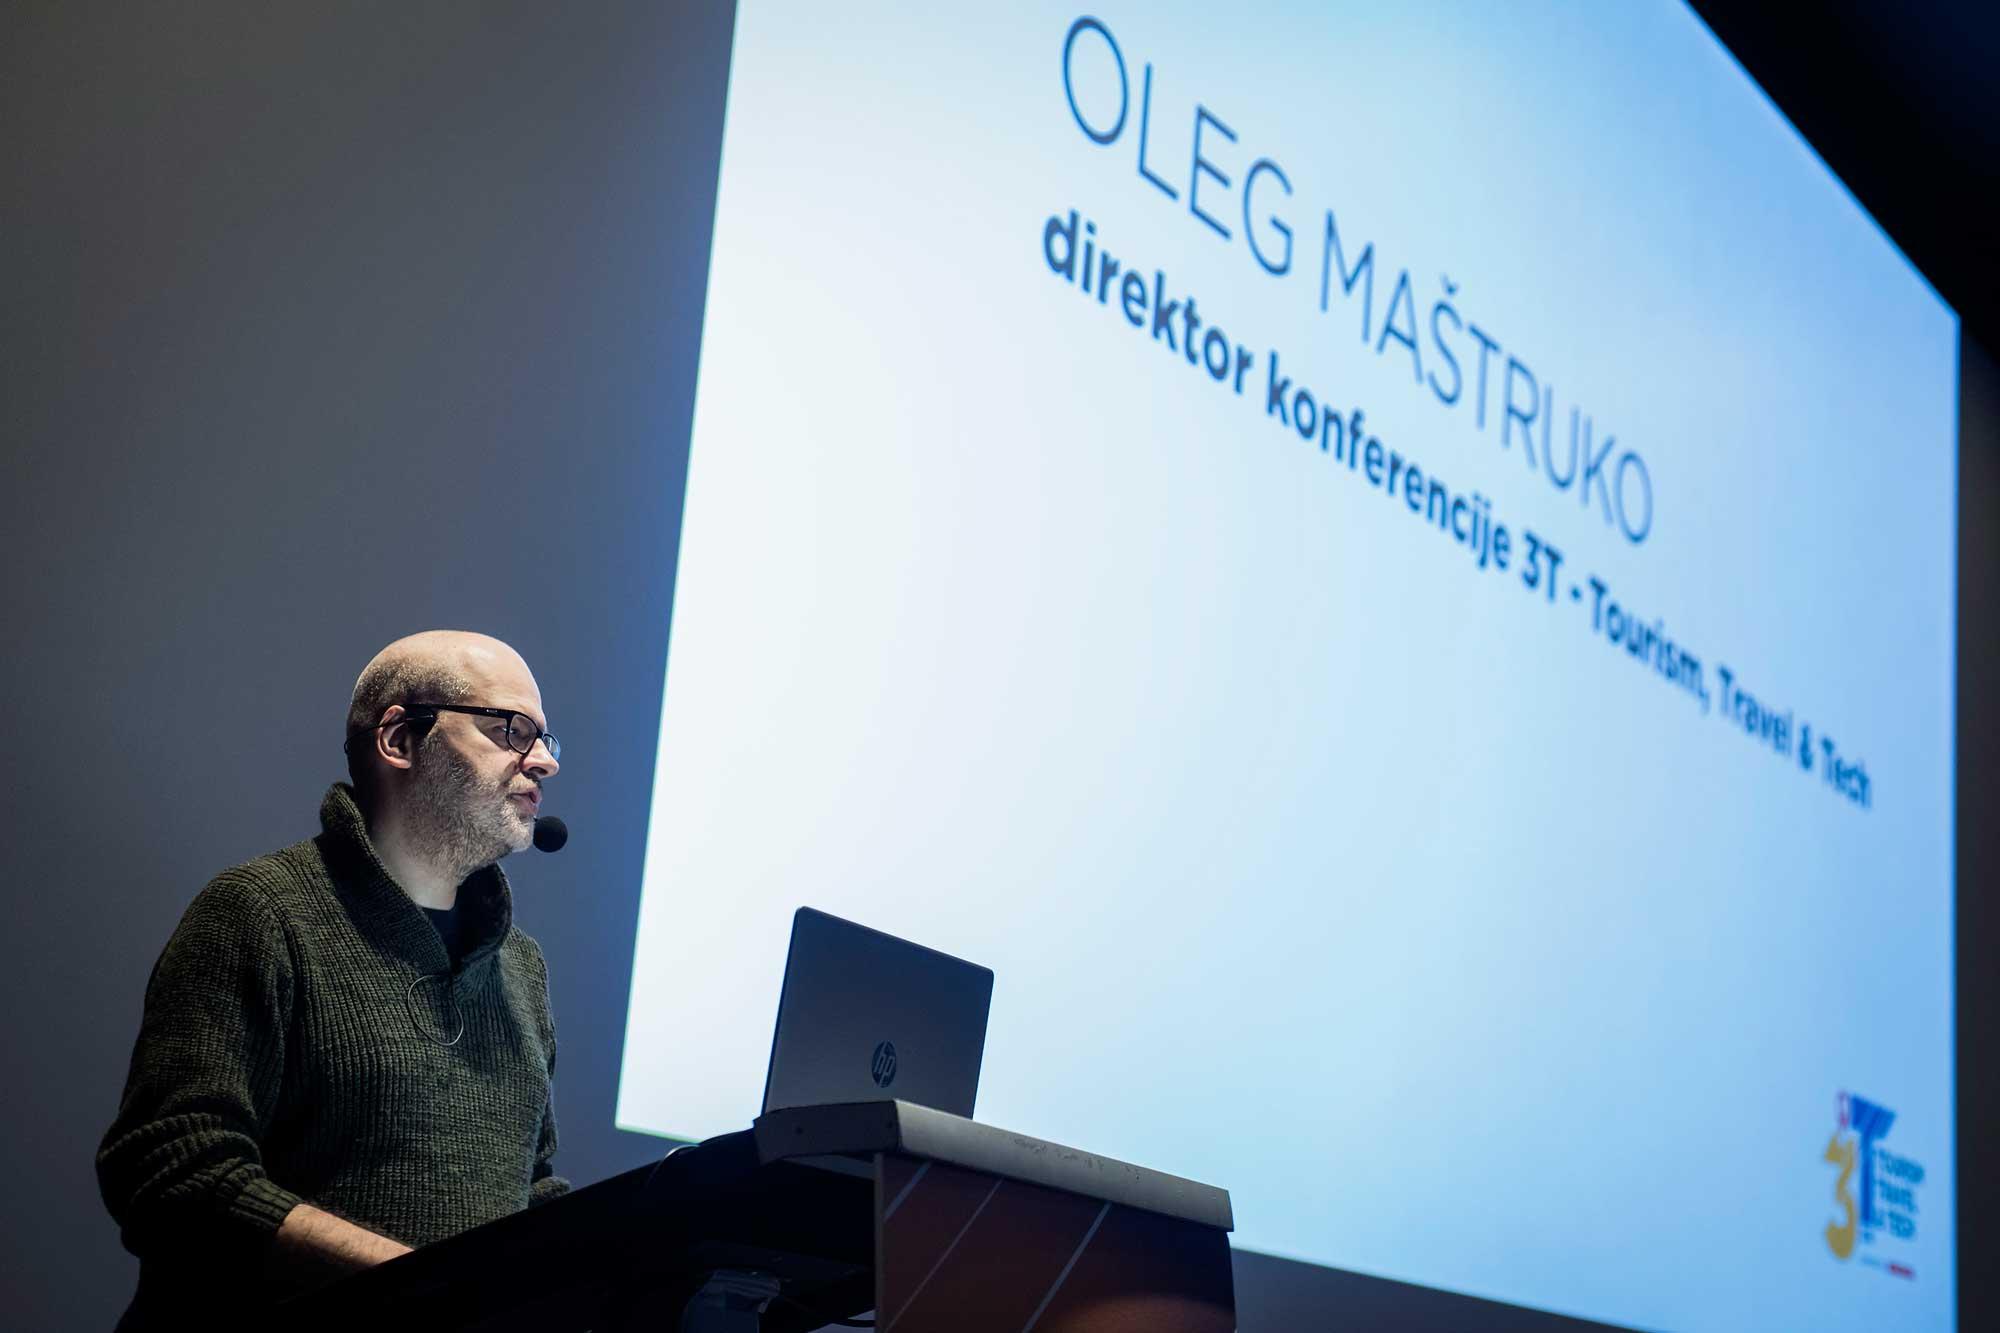 3T – Tourism, Travel & Tech konferencija - Oleg Maštruko